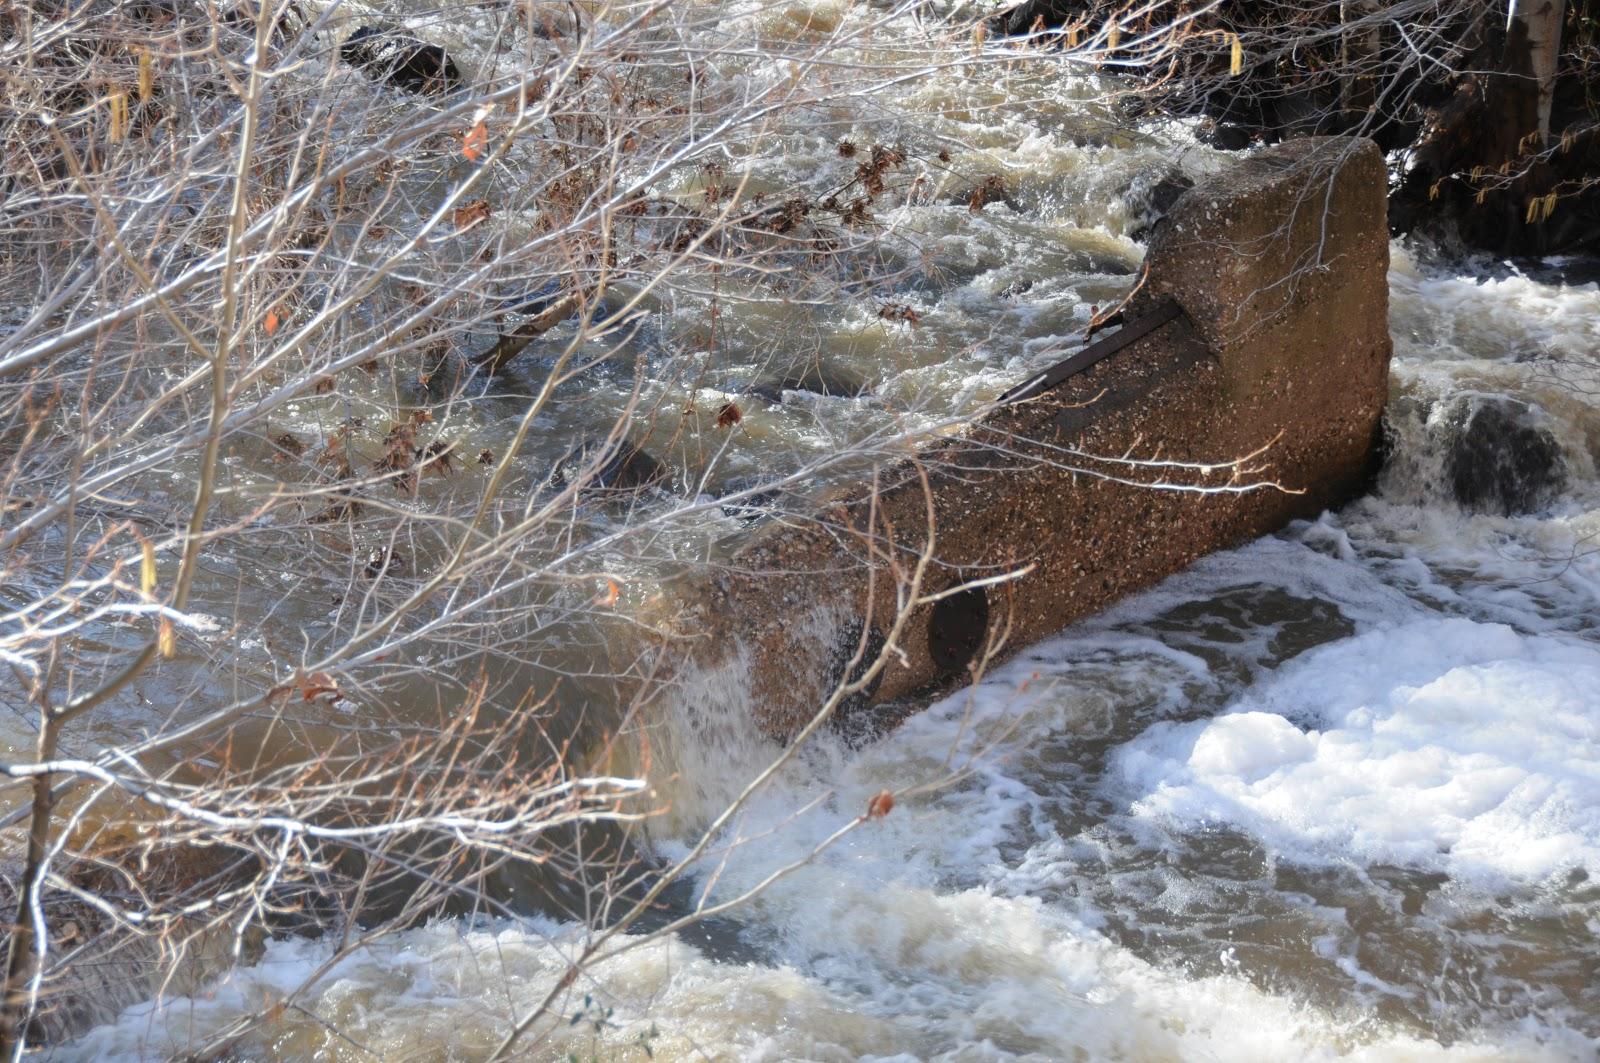 Arizona Hiking: Winter water clears the weir